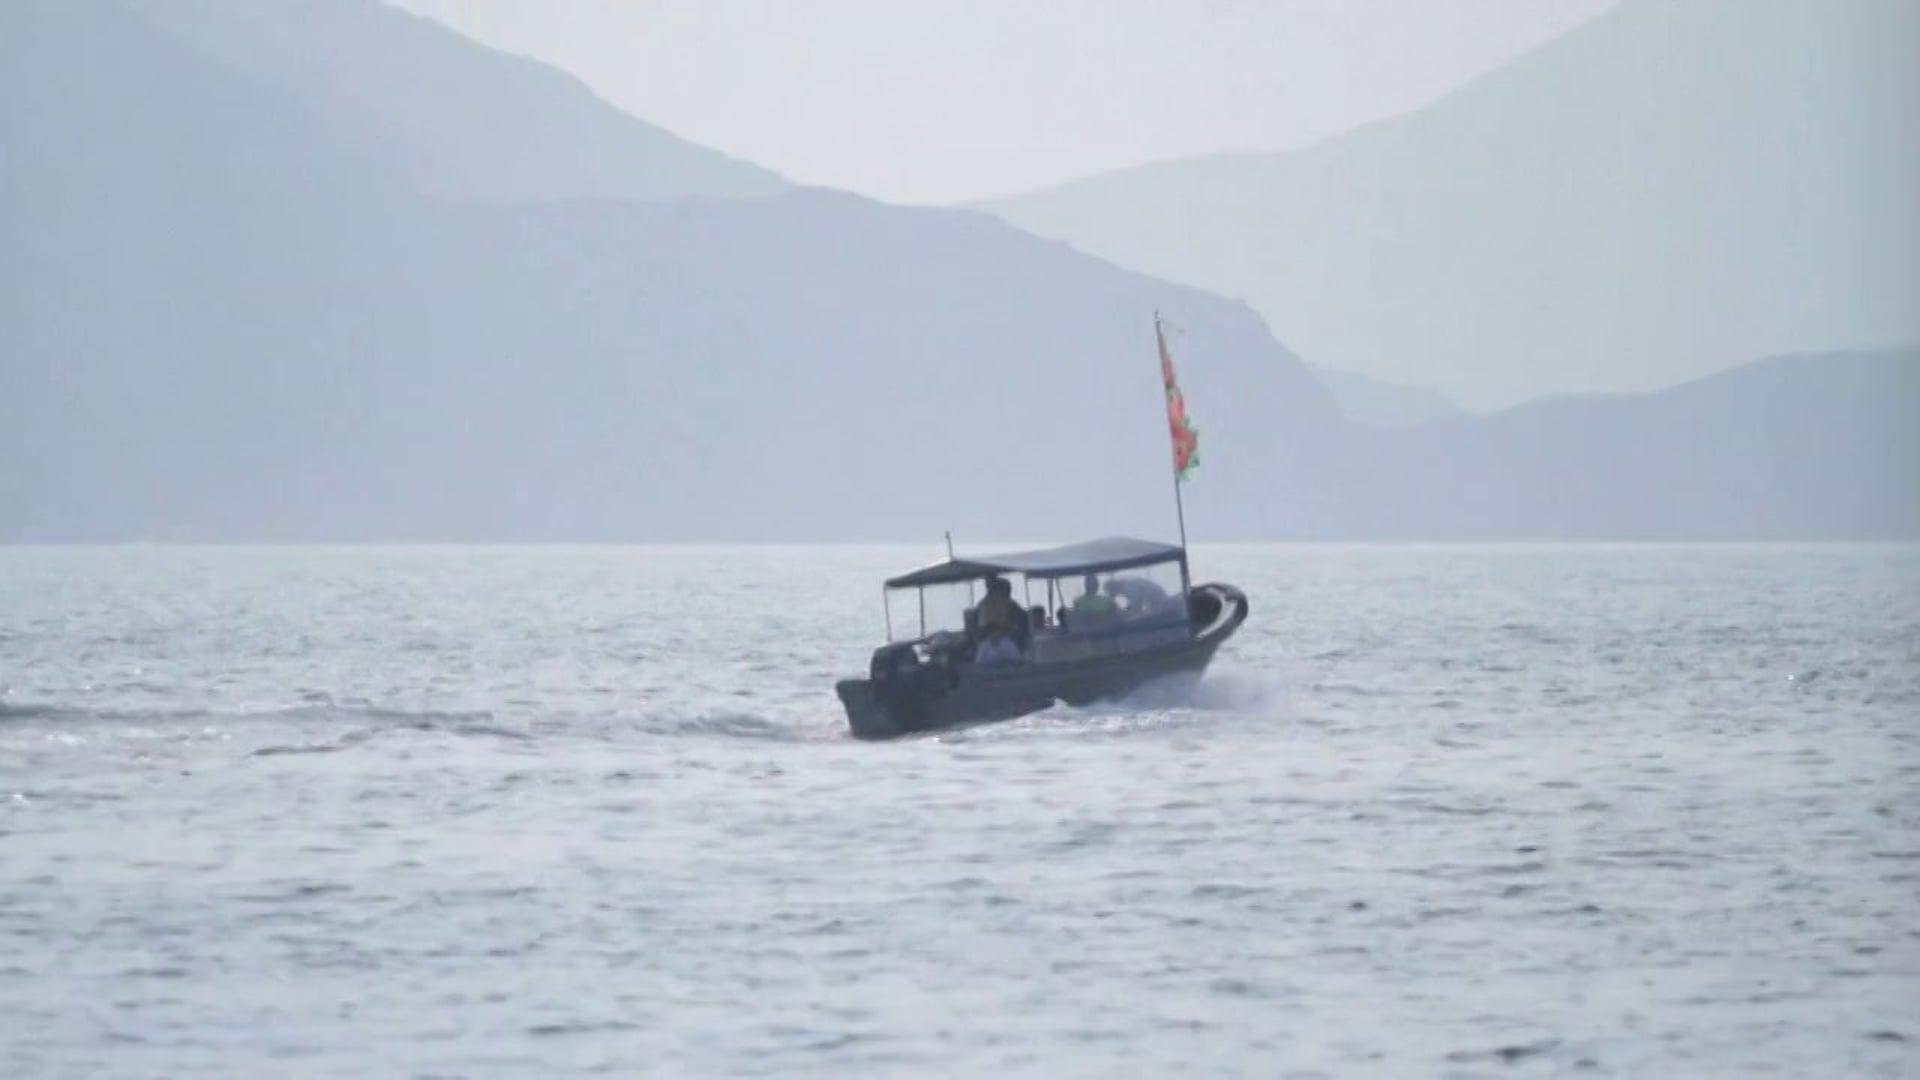 Buzz Po Toi fisherman race 2013